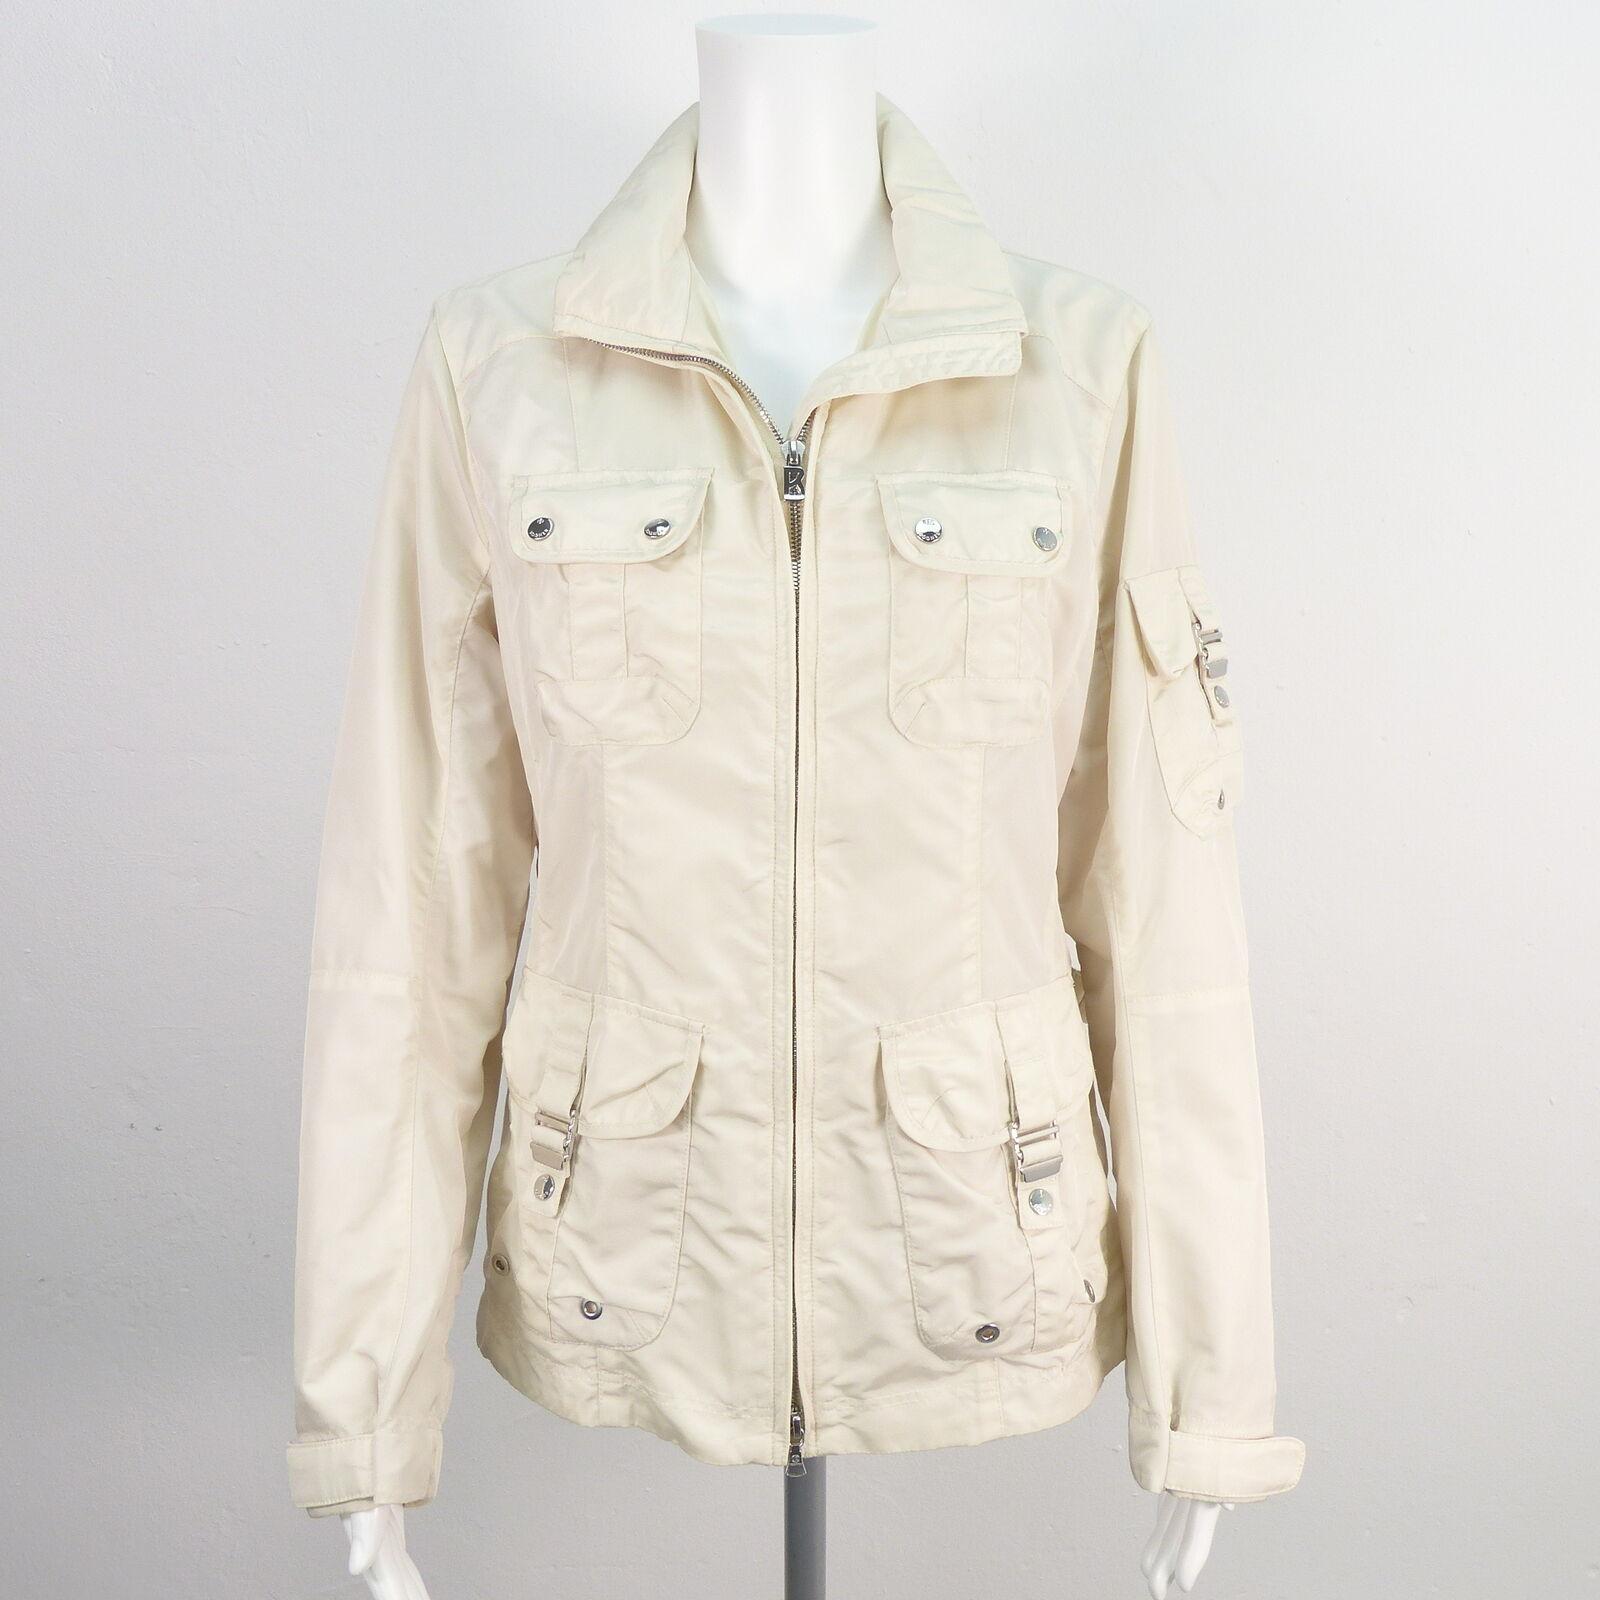 BOGNER Übergangsjacke Gr. DE 38 Cremeweiß Damen Frühlingsjacke Jacke Jacket